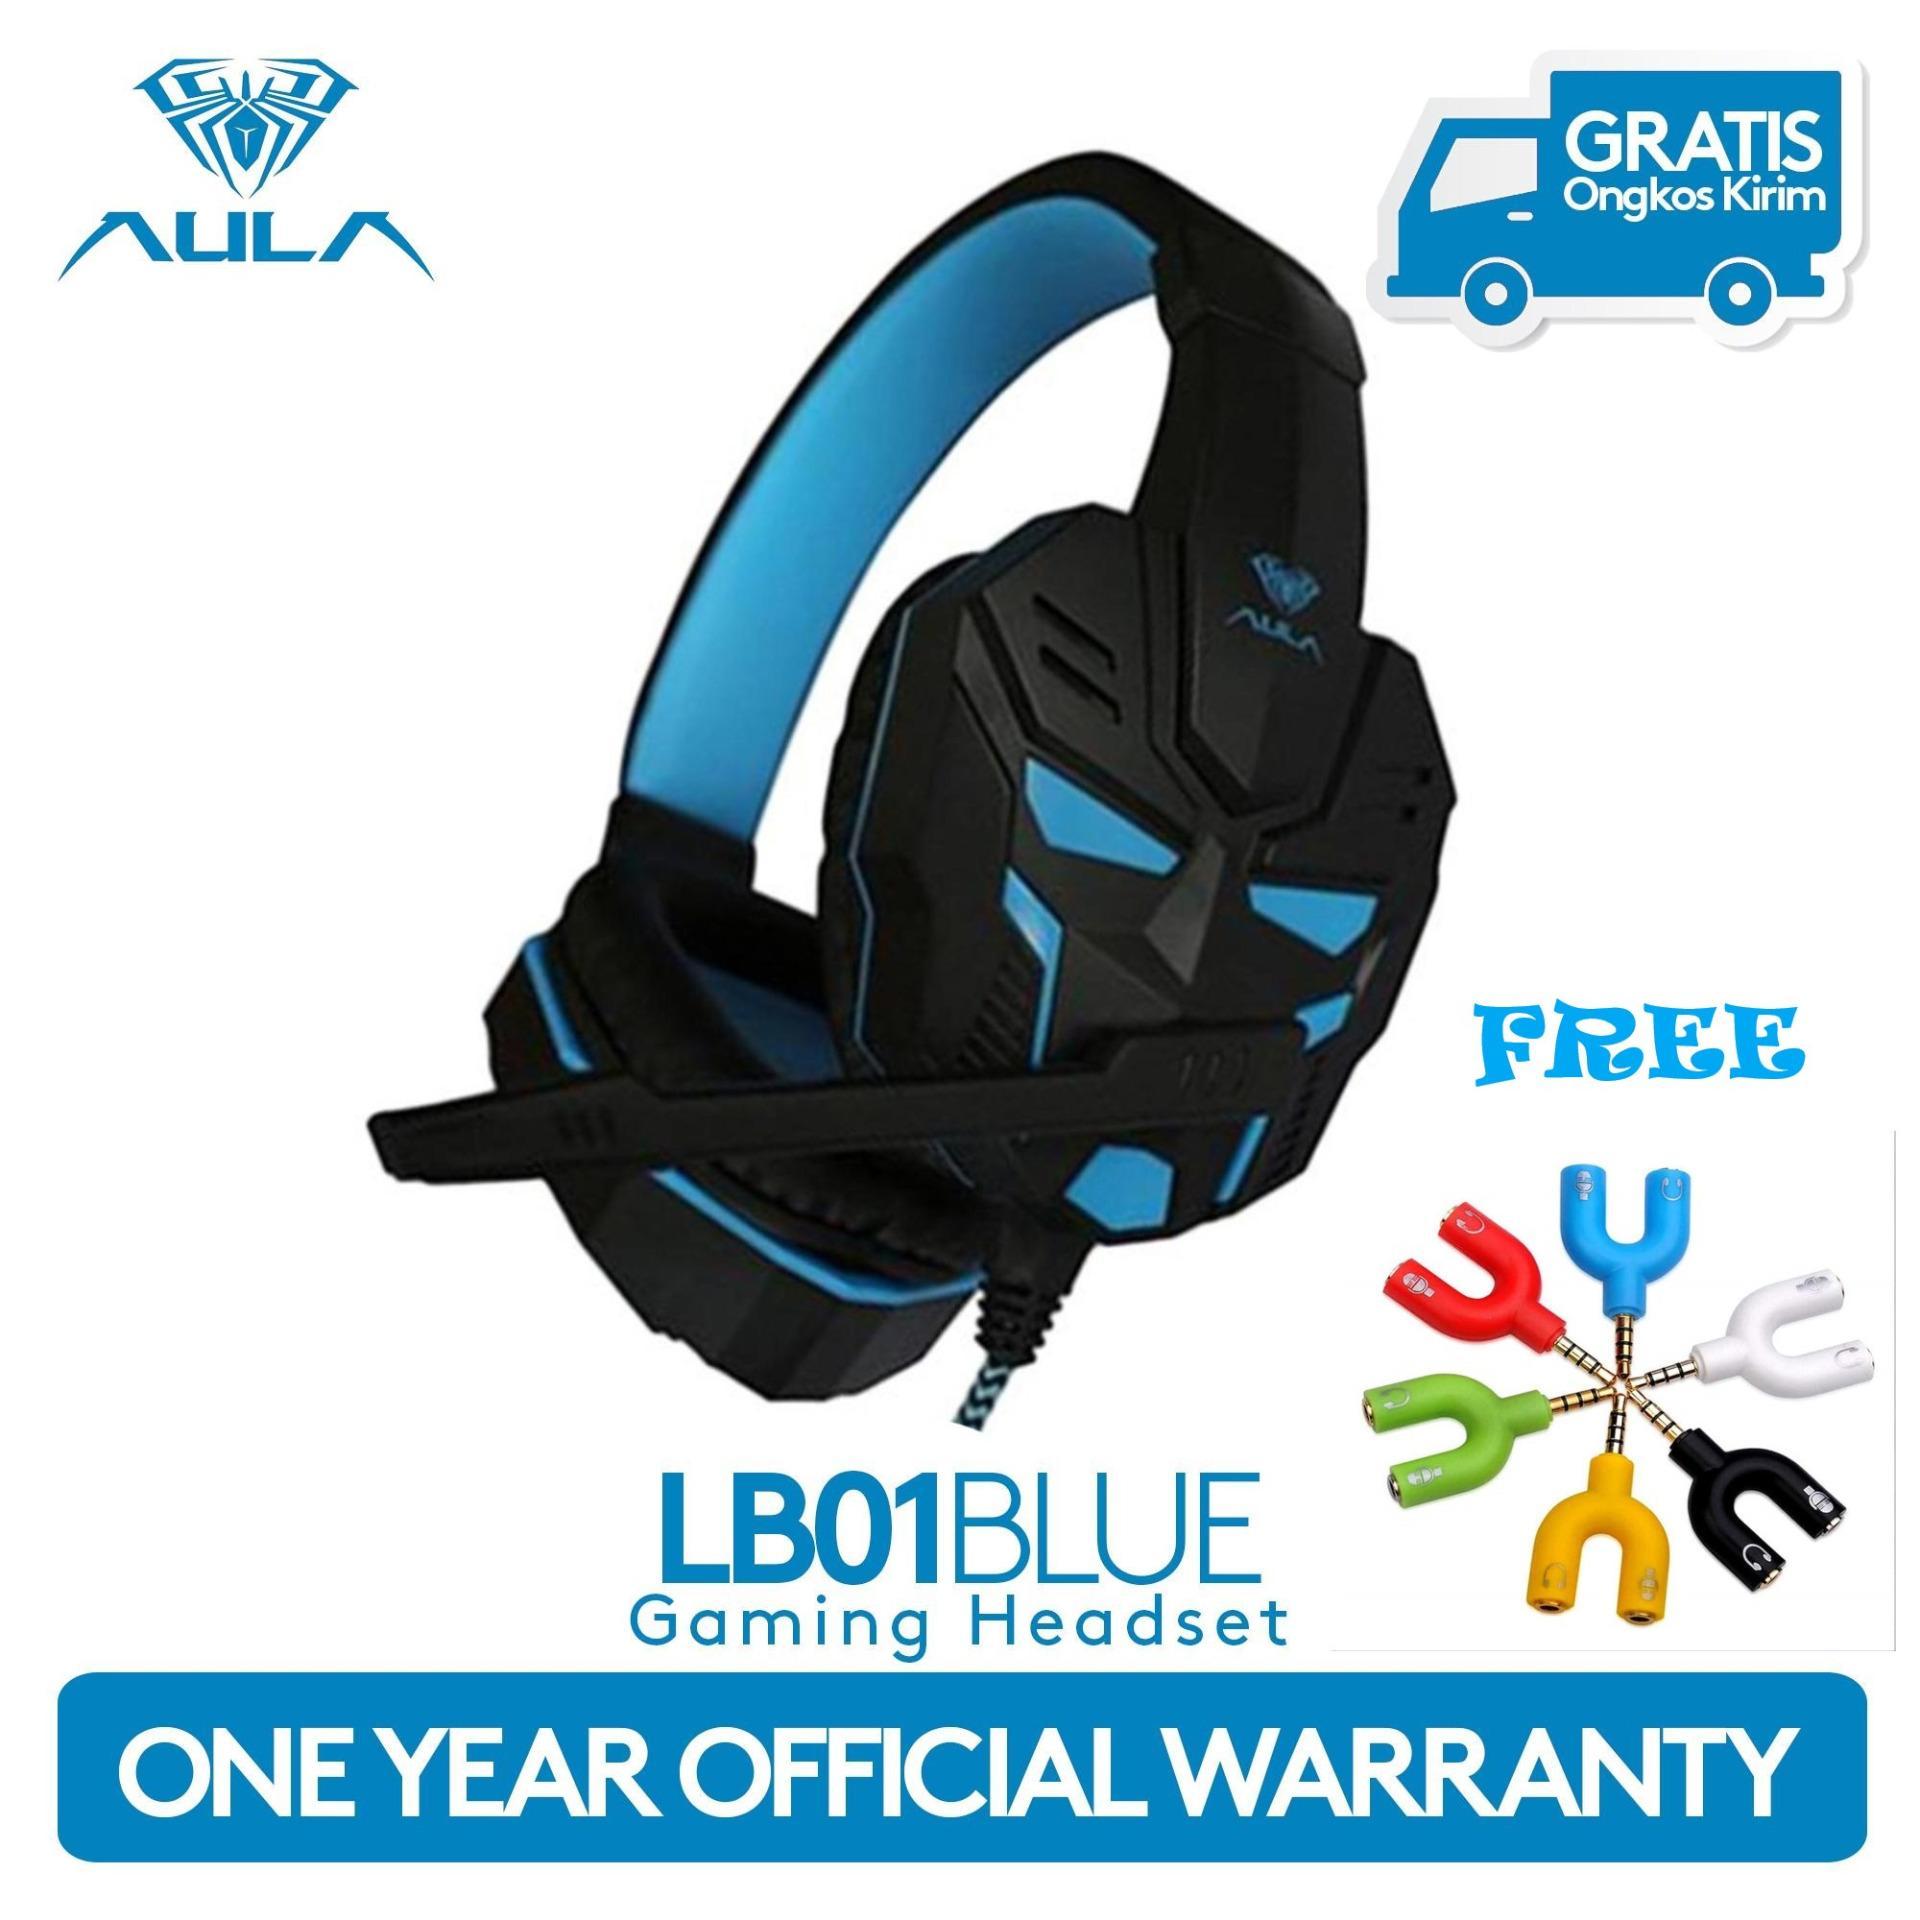 https://www.lazada.co.id/products/aula-lb01-prime-headset-gaming-with-mic-jack-35-hitam-list-biru-i126312749-s132769934.html